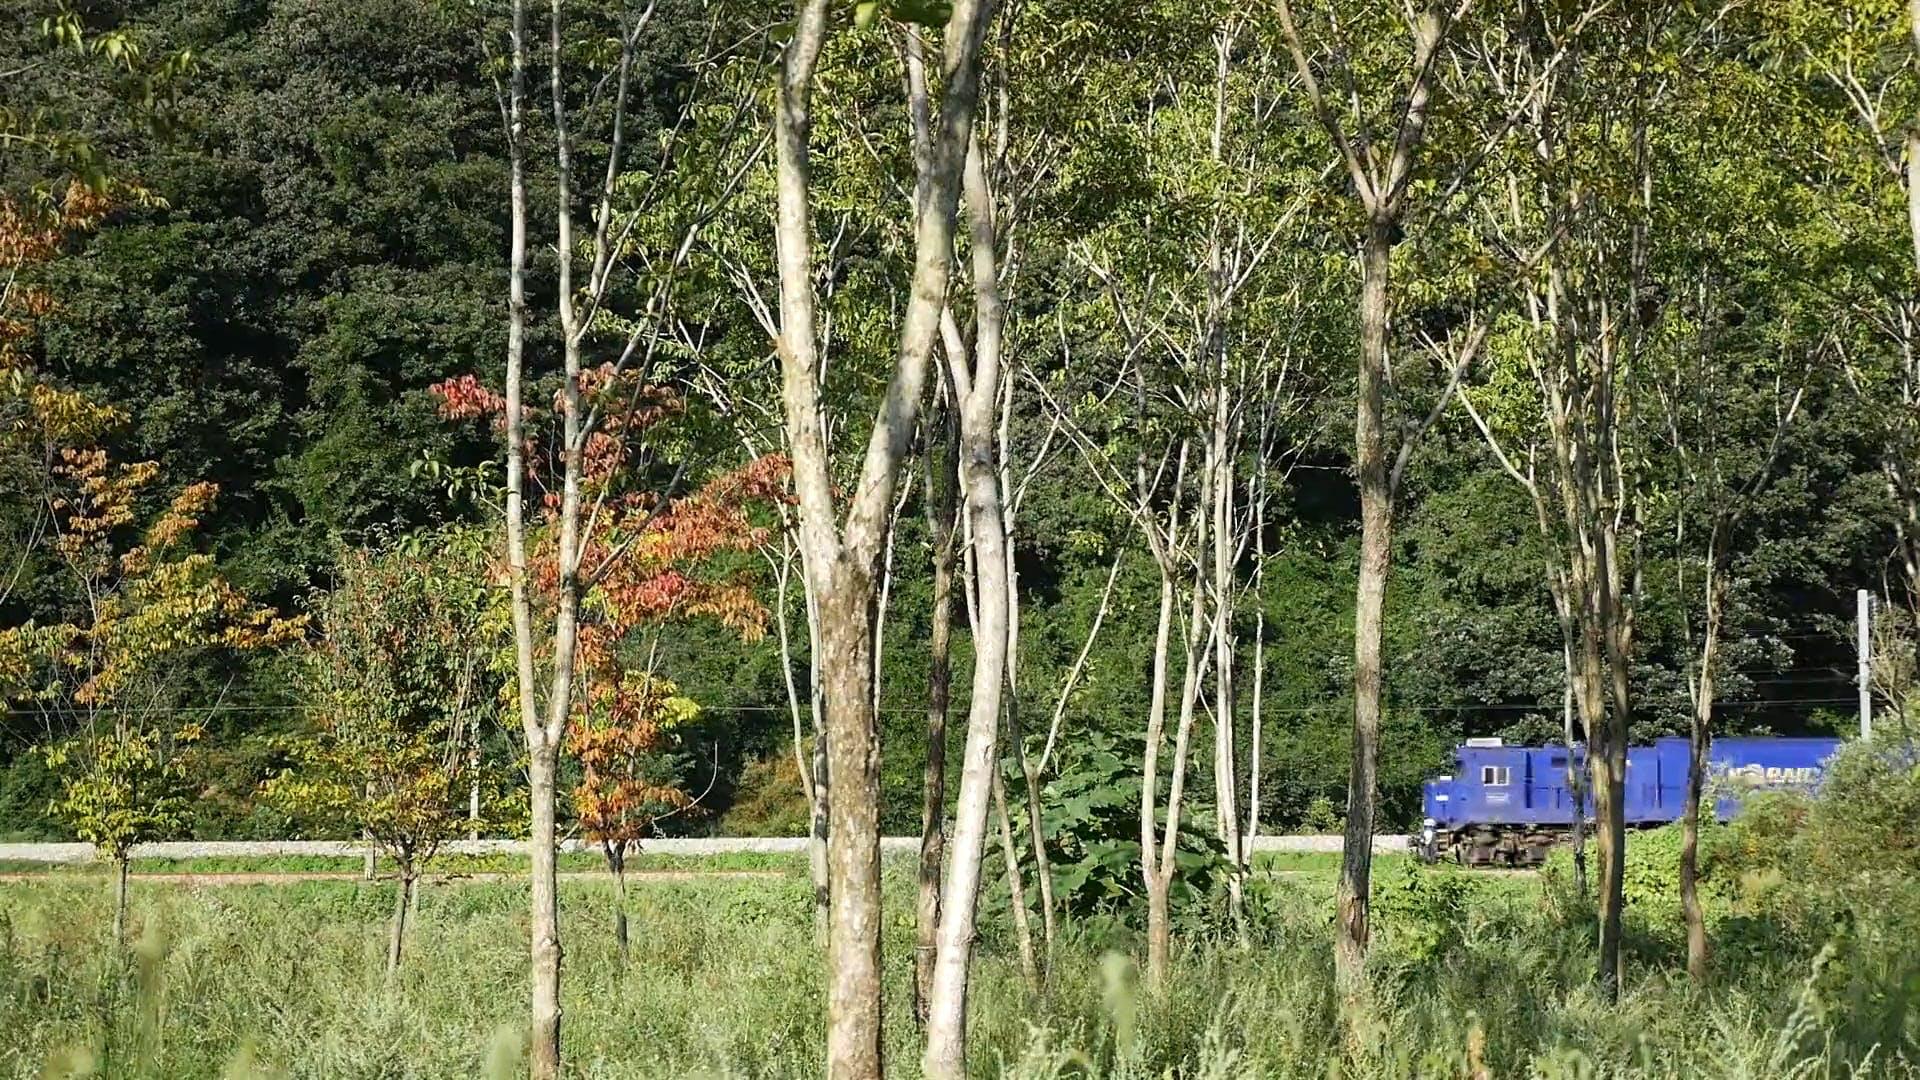 Train Passing Through Trees